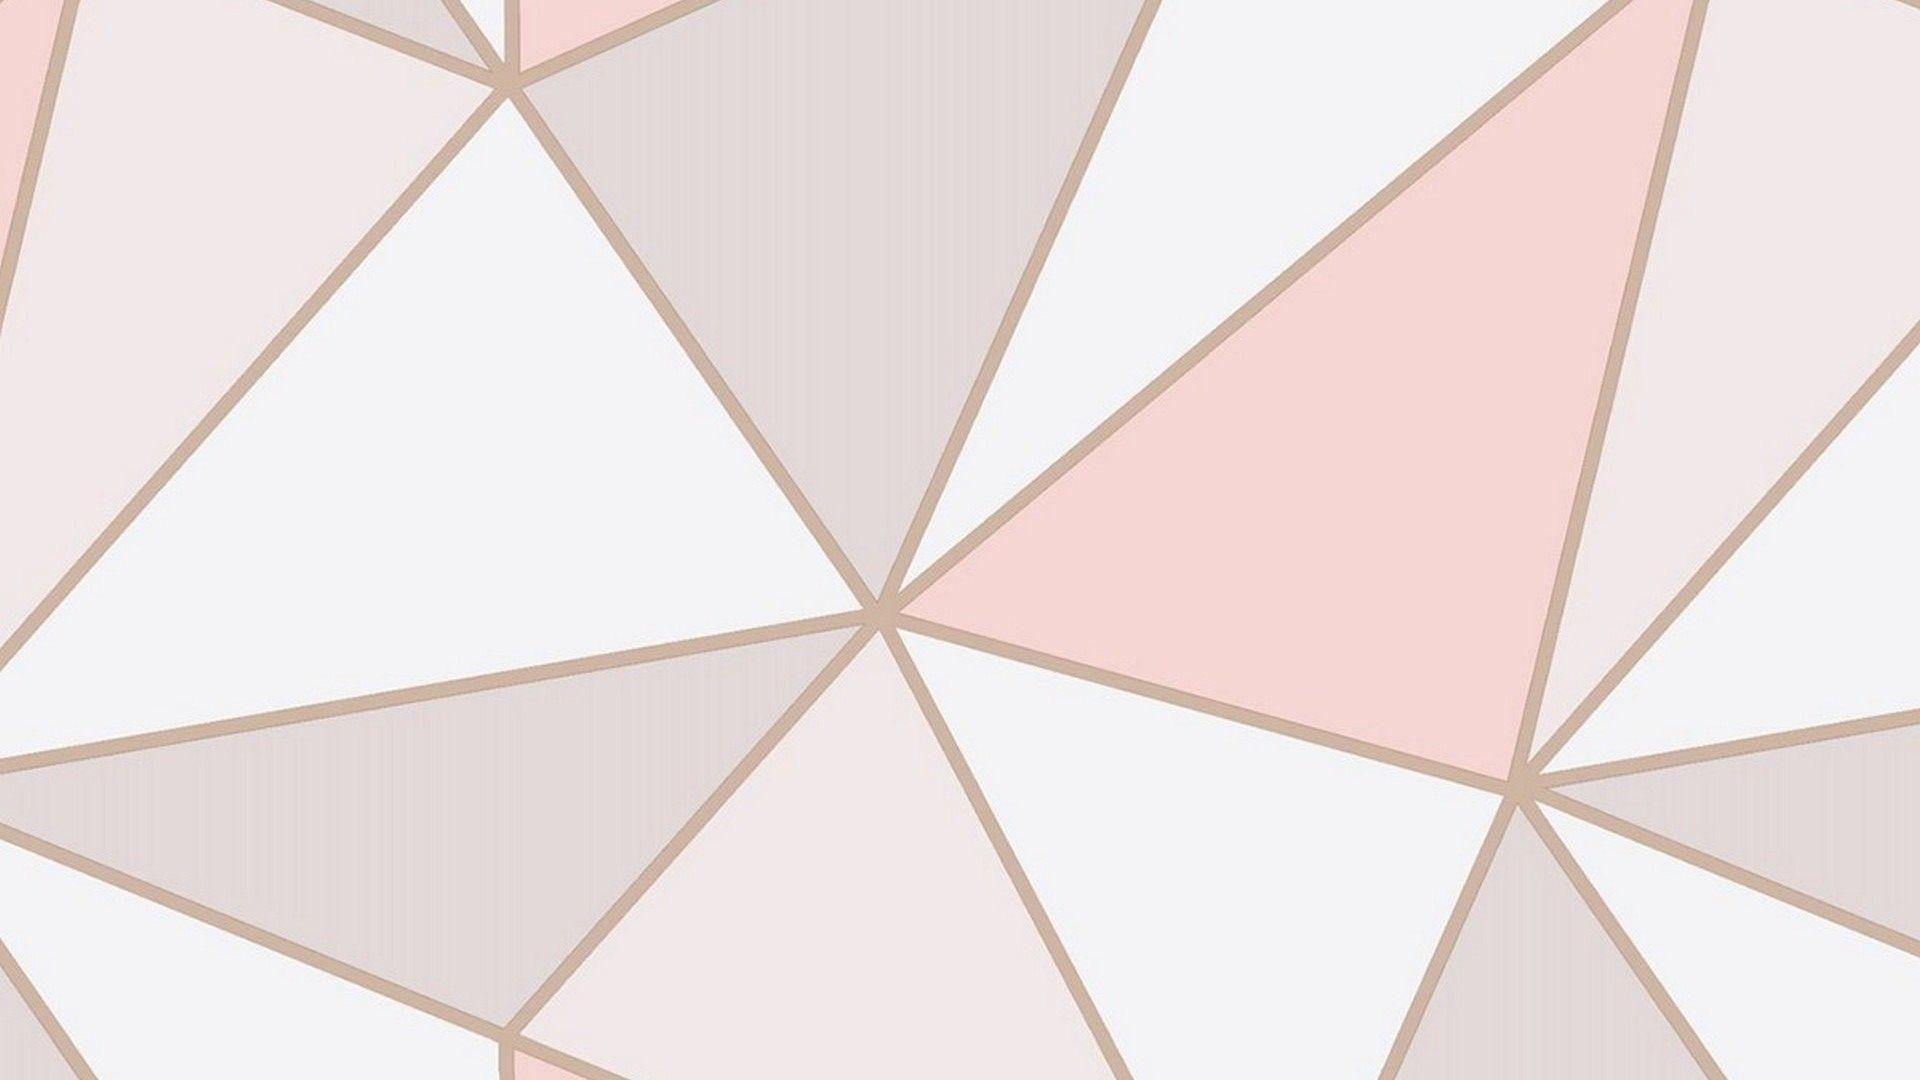 Rose Gold Cute Desktop Wallpaper